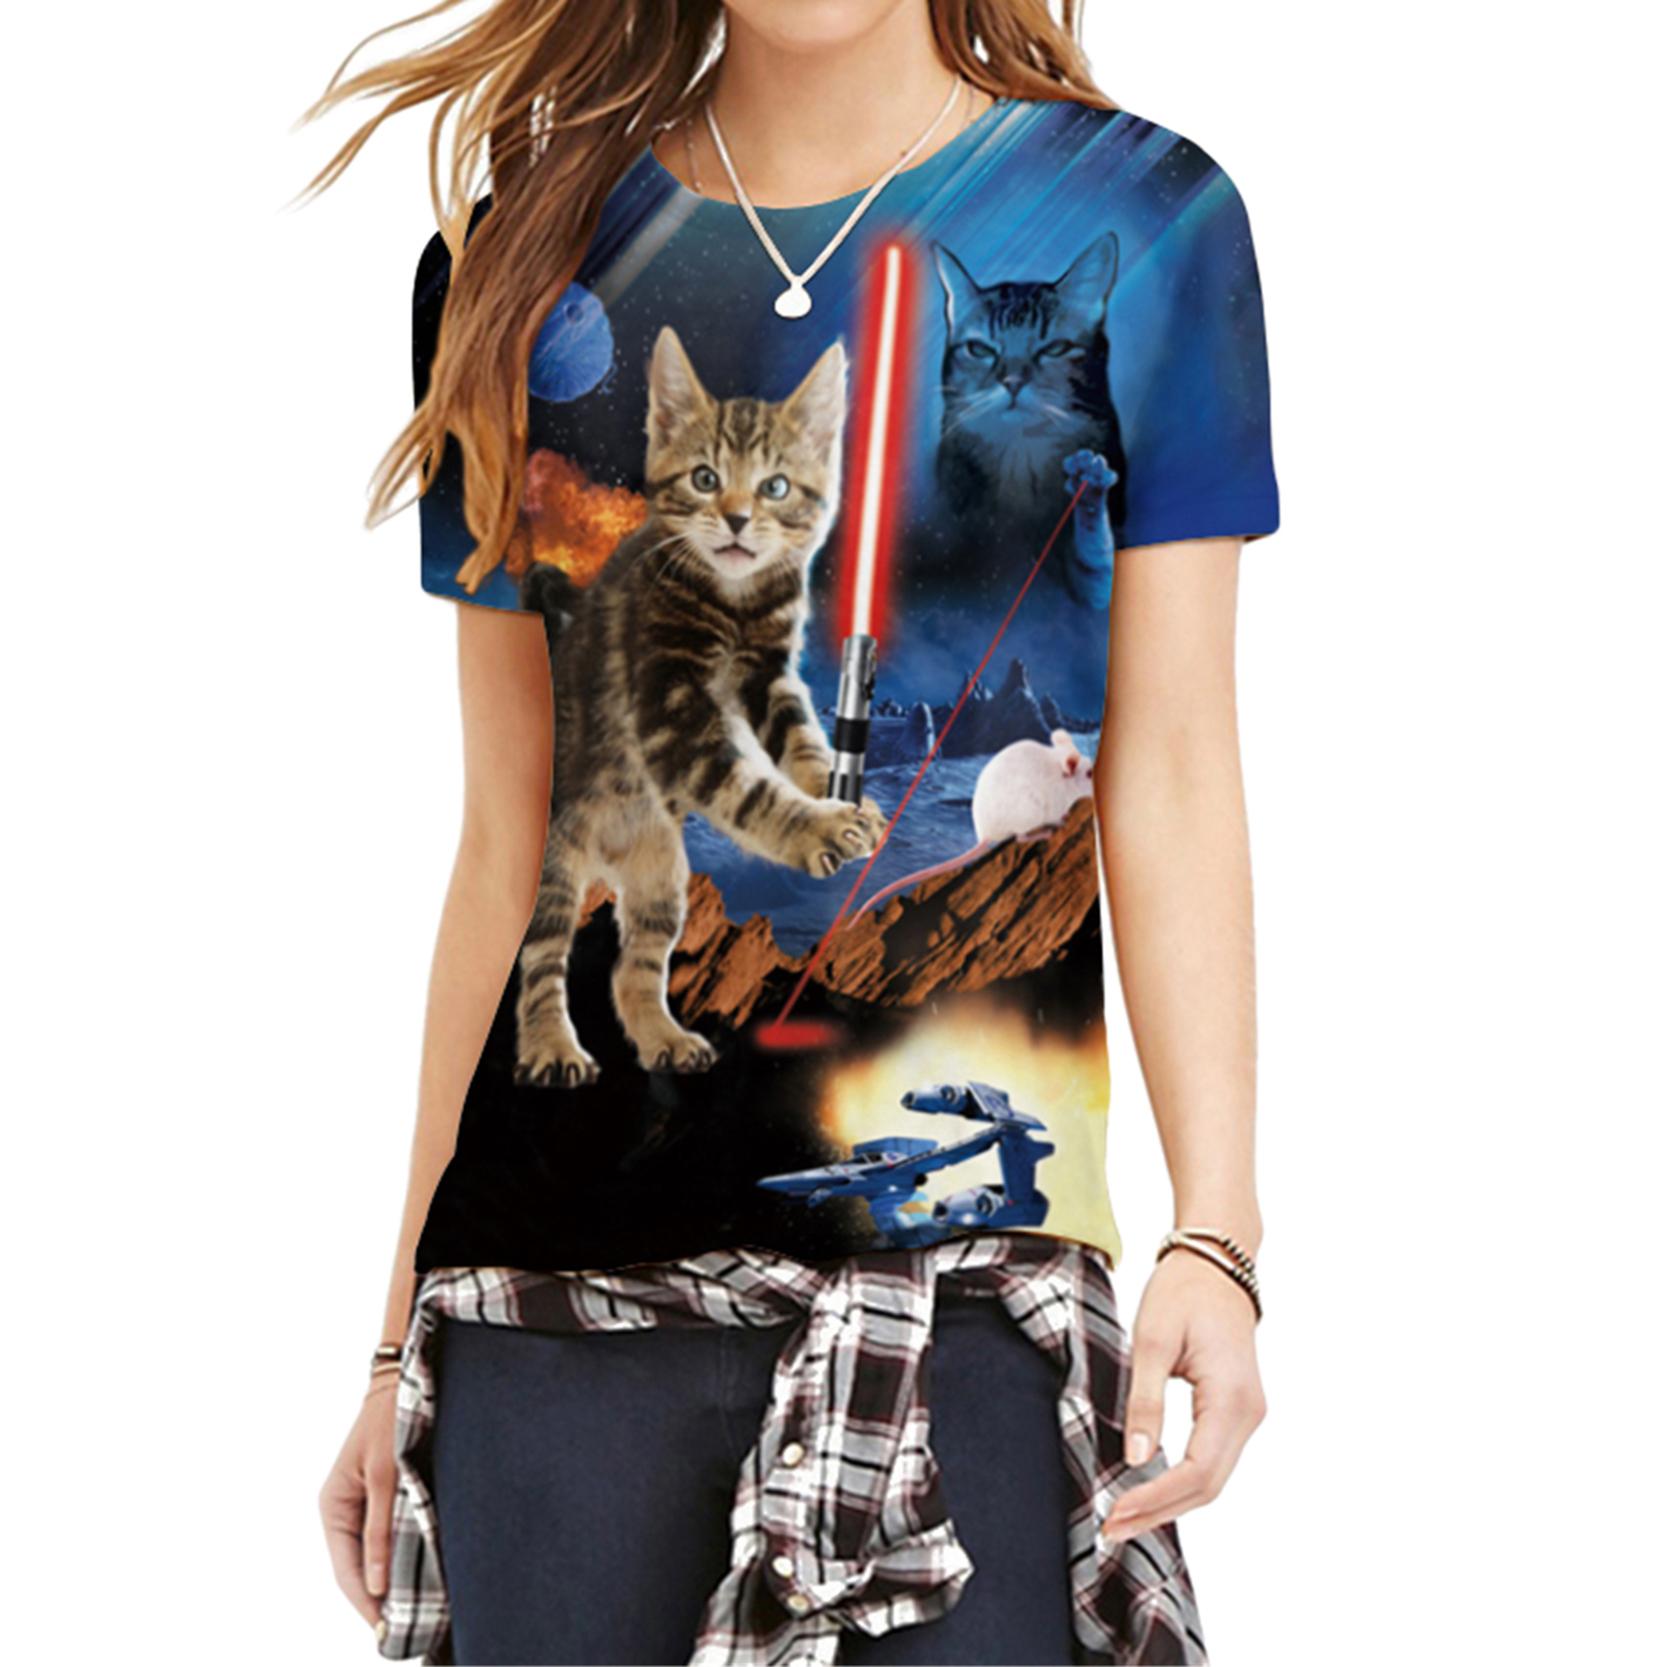 Shining Sword Animal Pattern Lunky Women T-Shirts Cool Cats Wars New Fashion 3D Cartoon Print T-shirt Tops Tees Clothing(China (Mainland))